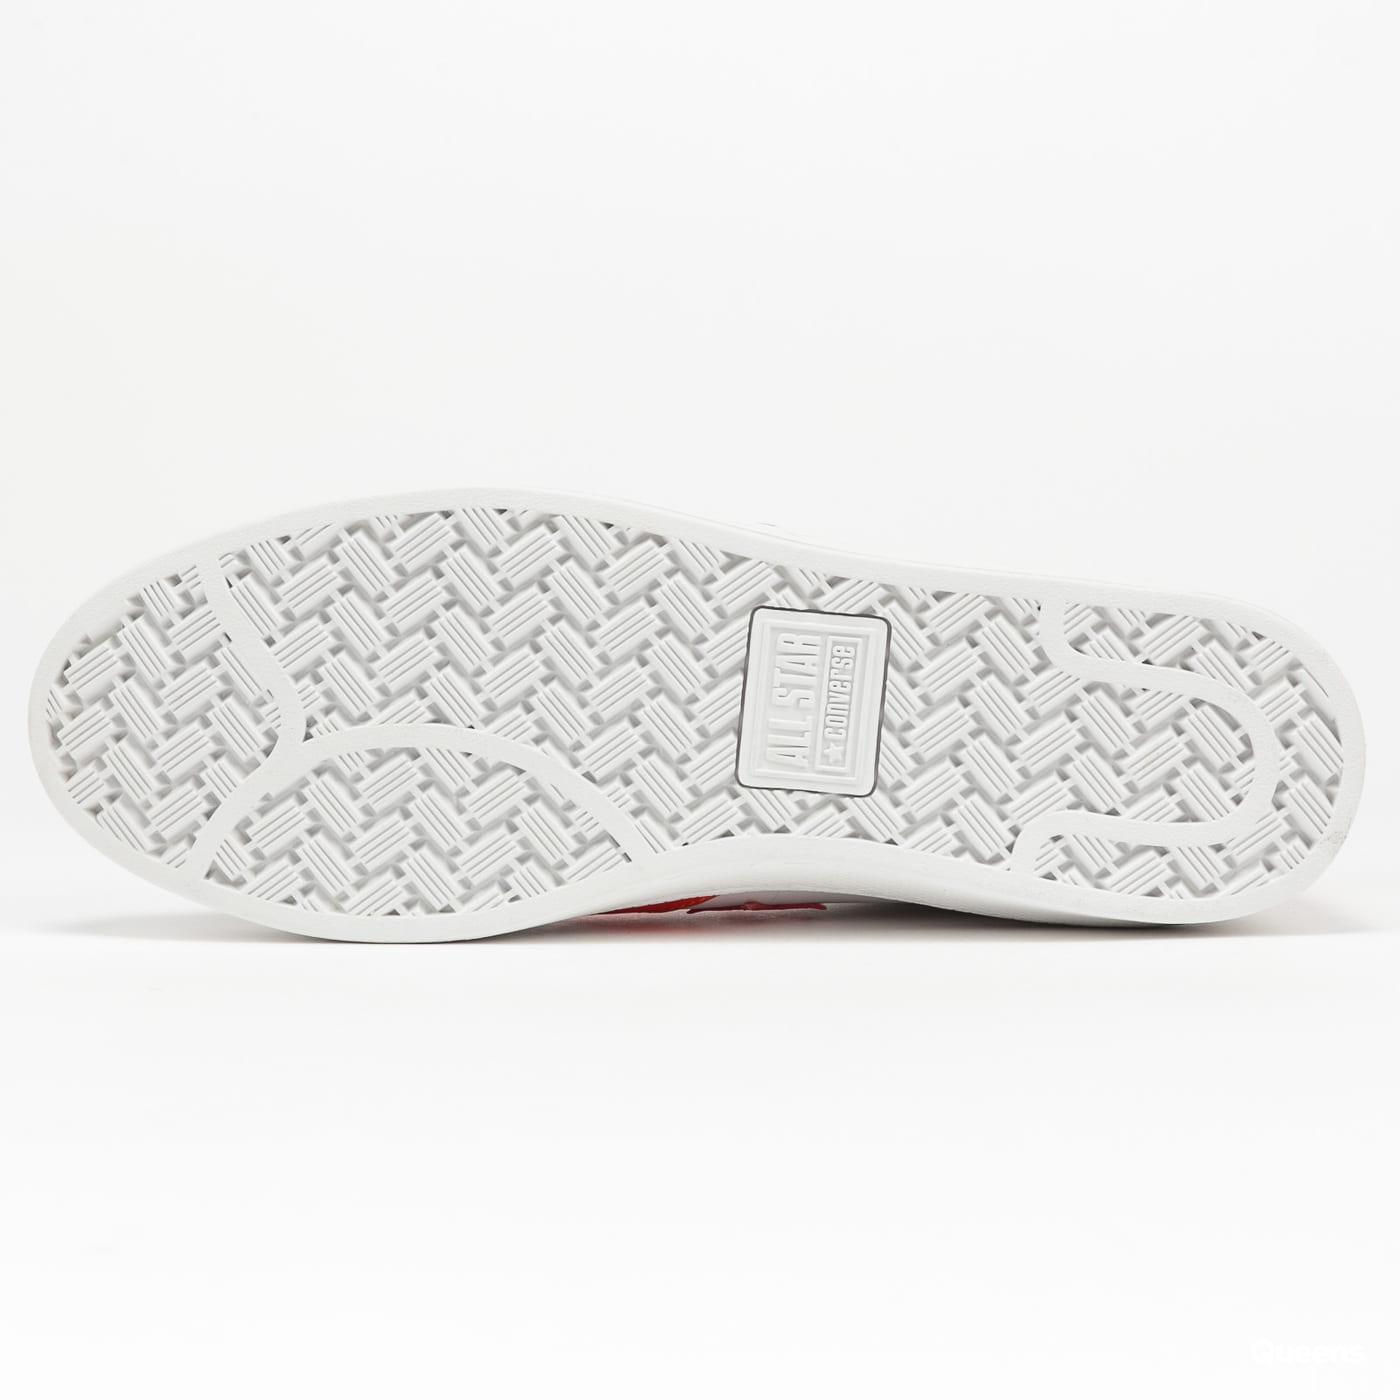 Converse Pro Leather OX white / bright poppy / white